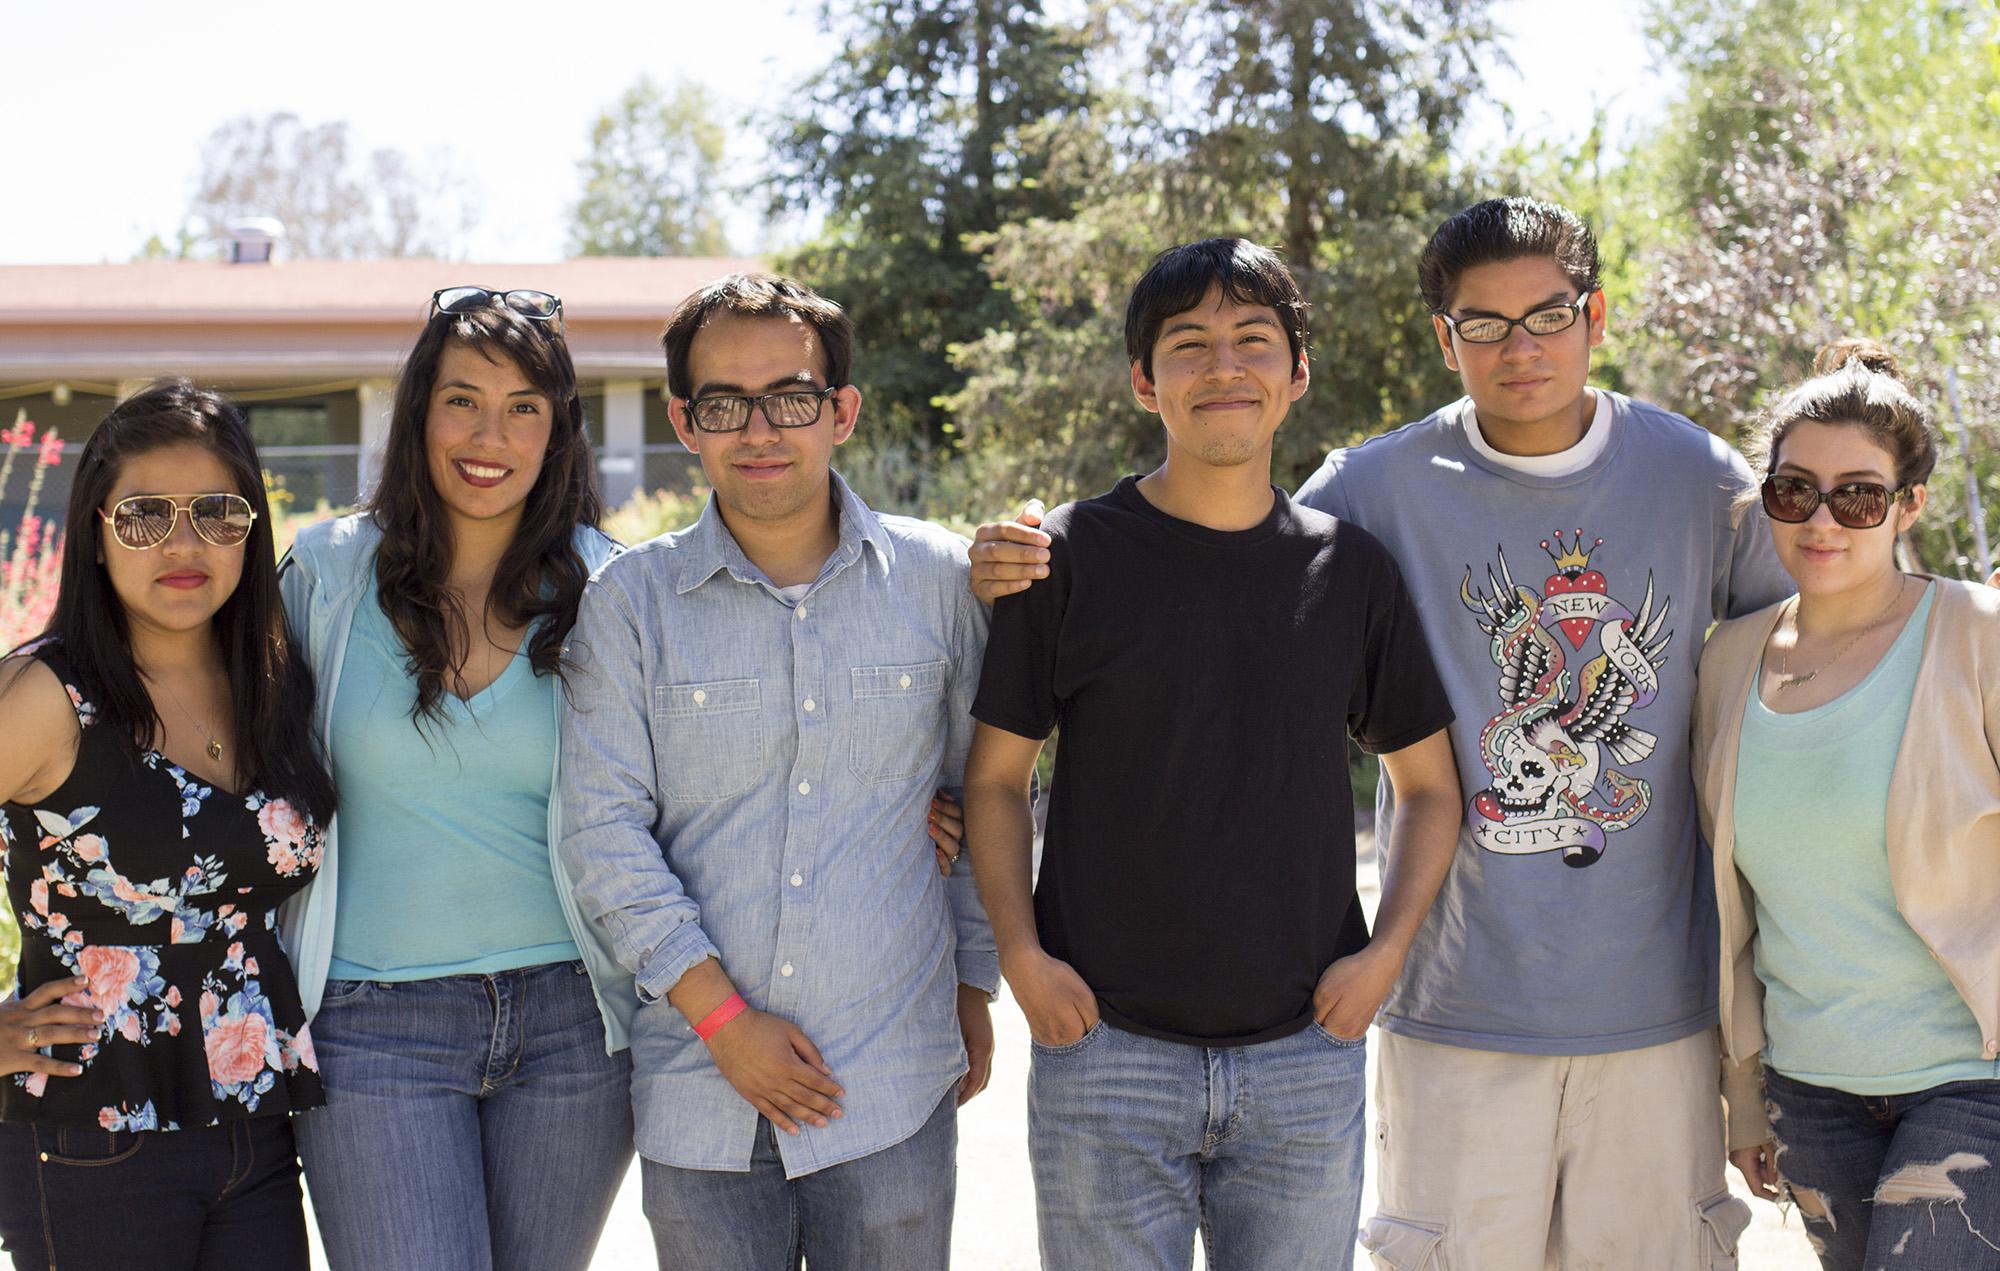 Club 411: We B.U.I.L.D. unites student immigrants